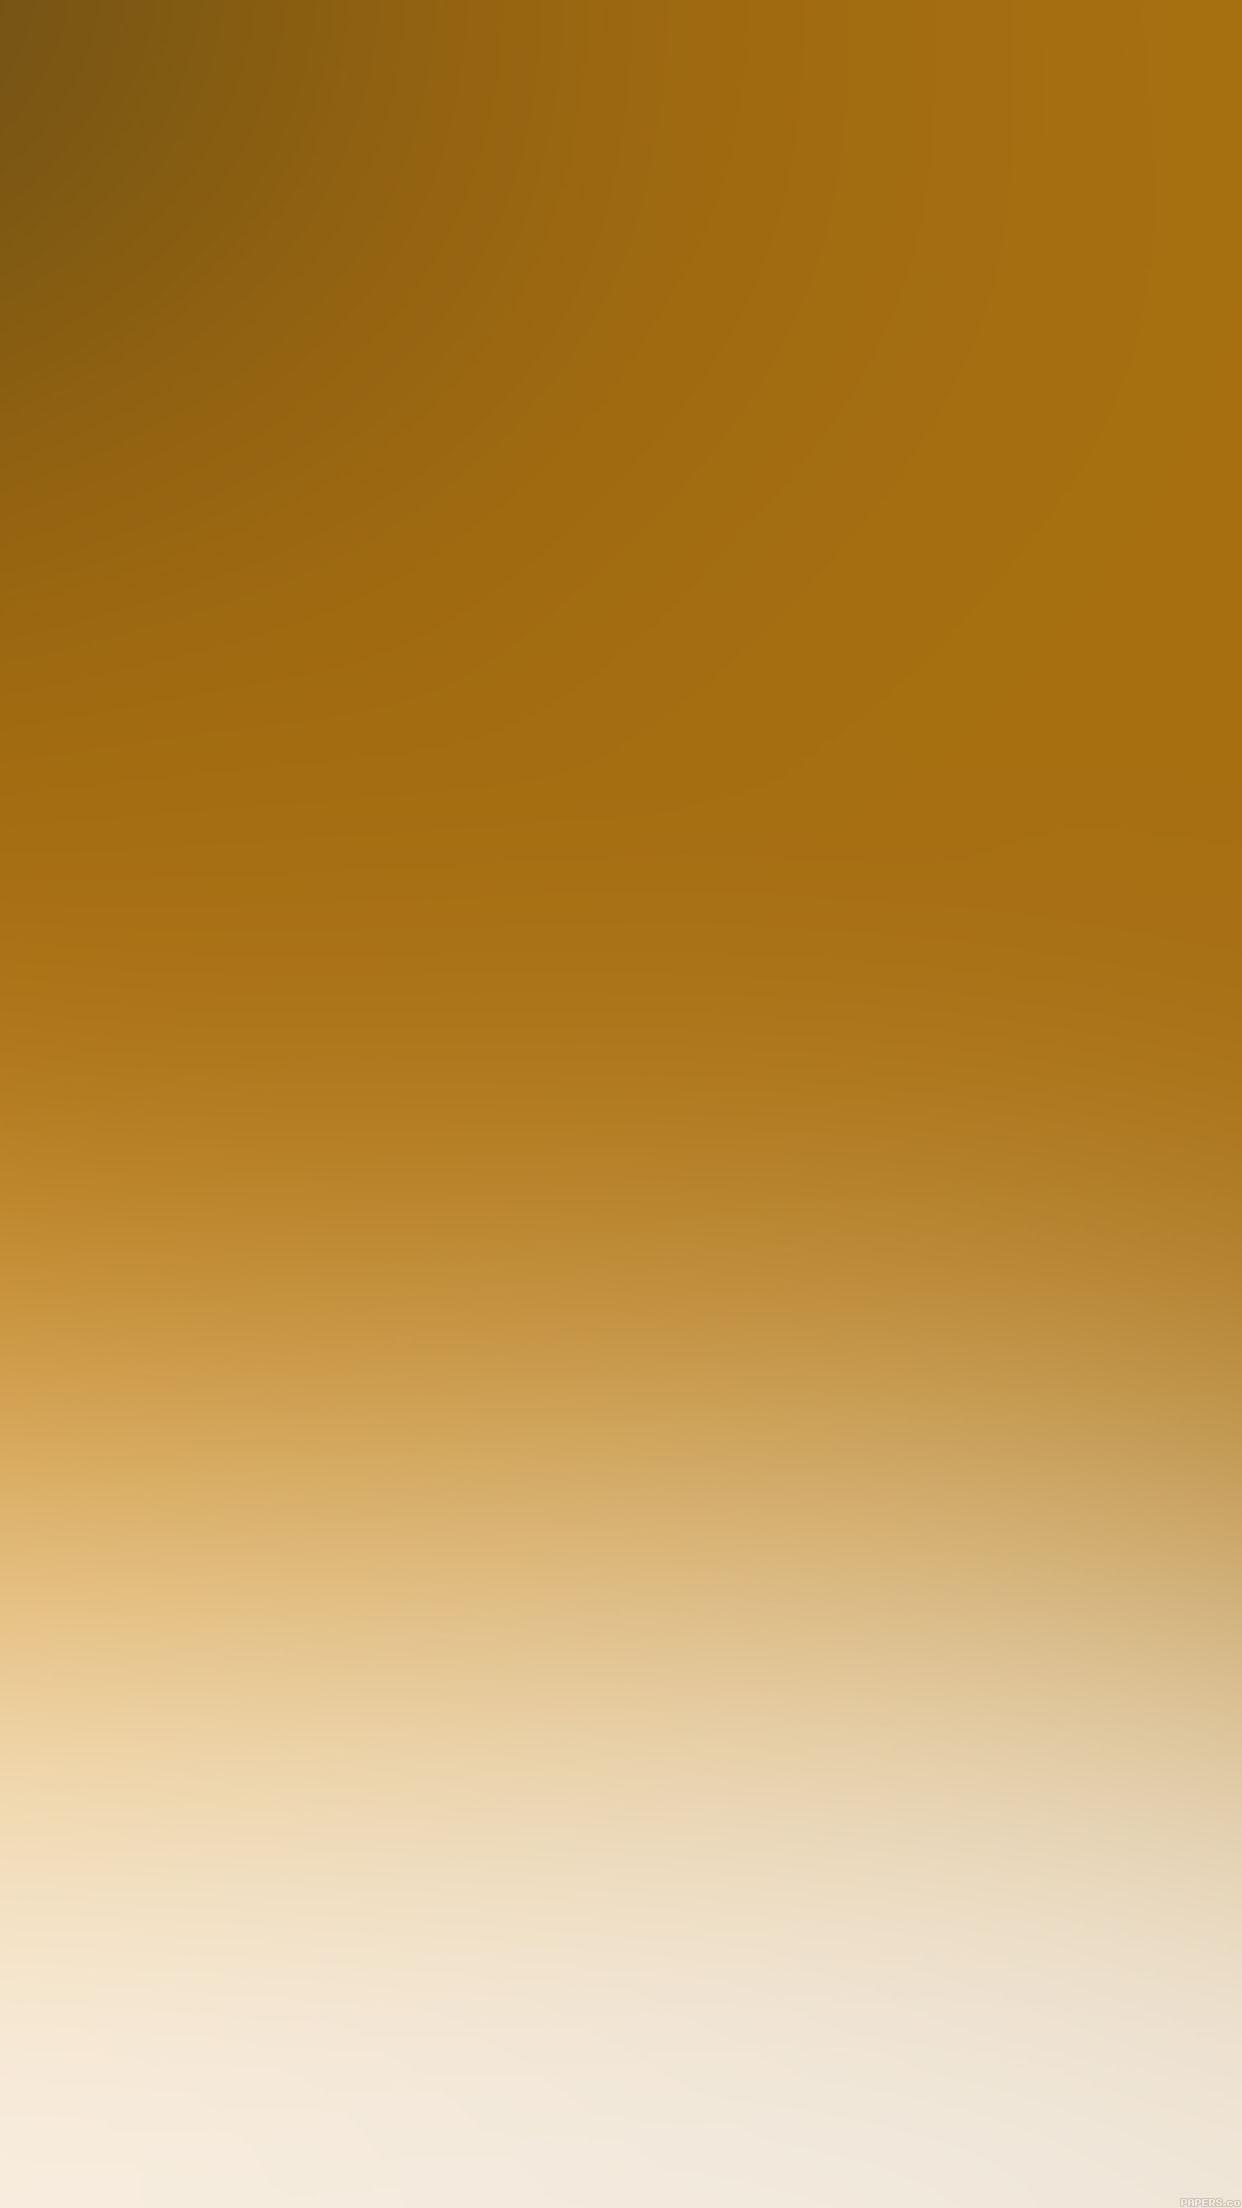 Iphone6papers Sa73 Wallpaper Golden Sky Blur